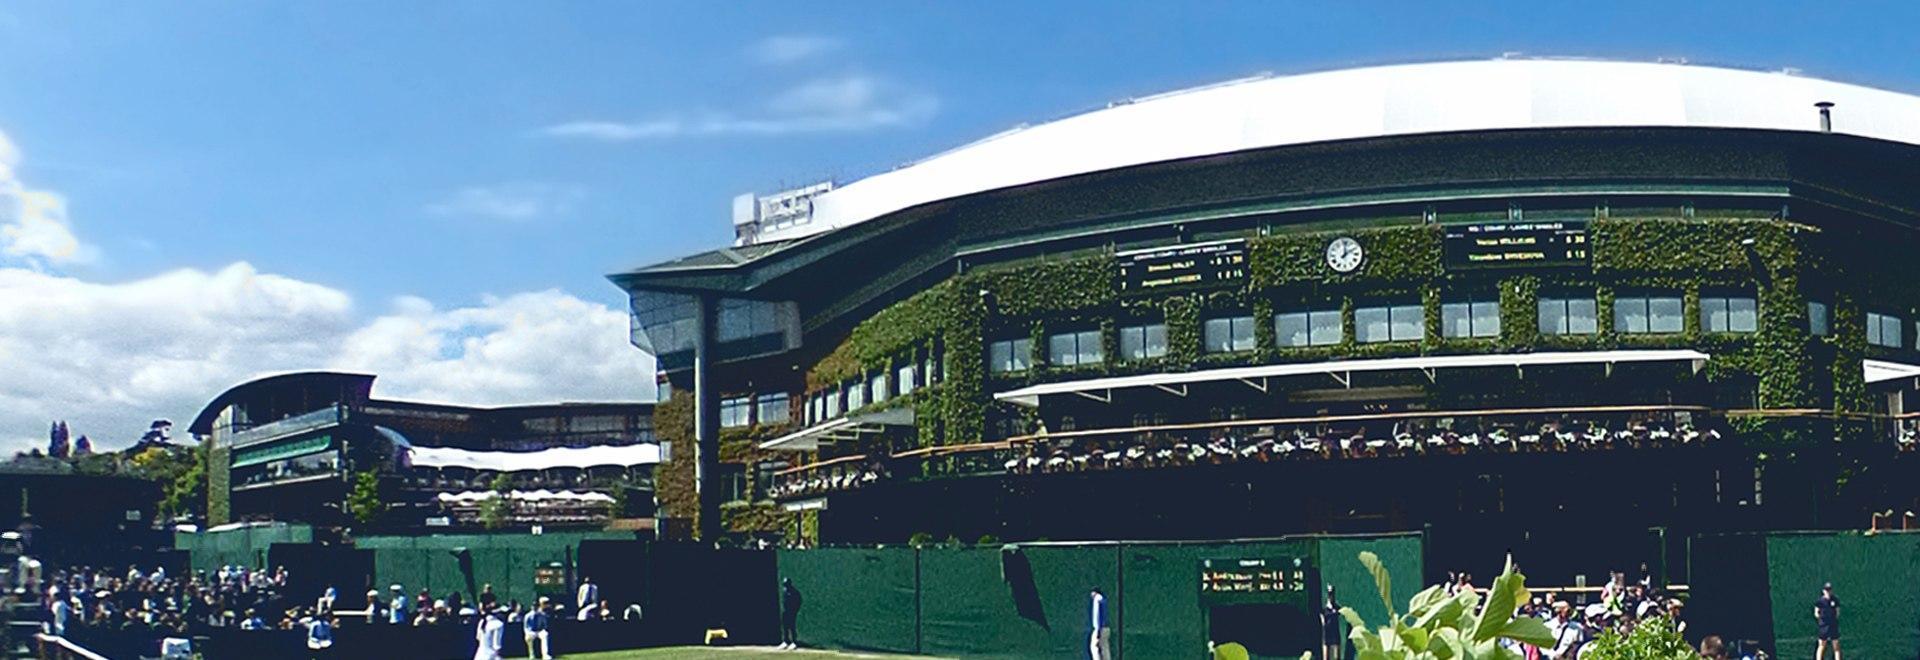 Wimbledon 2018: Djokovic - Nadal. Semifinale